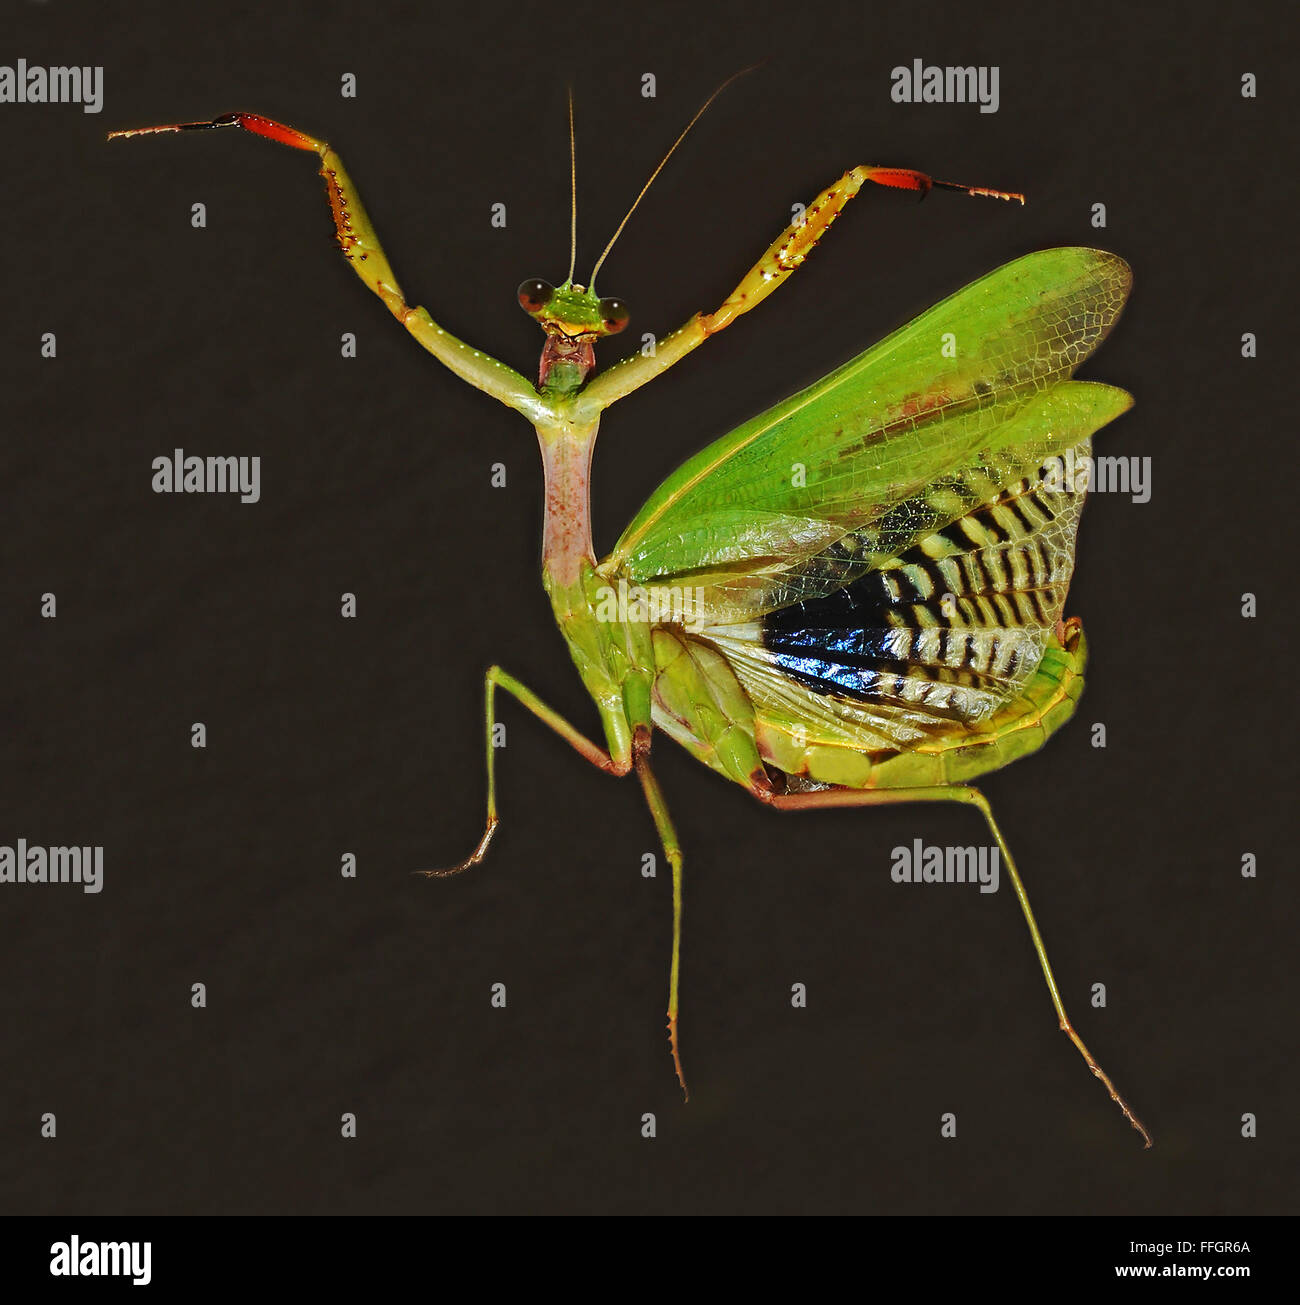 praying mantis on black background Stock Photo